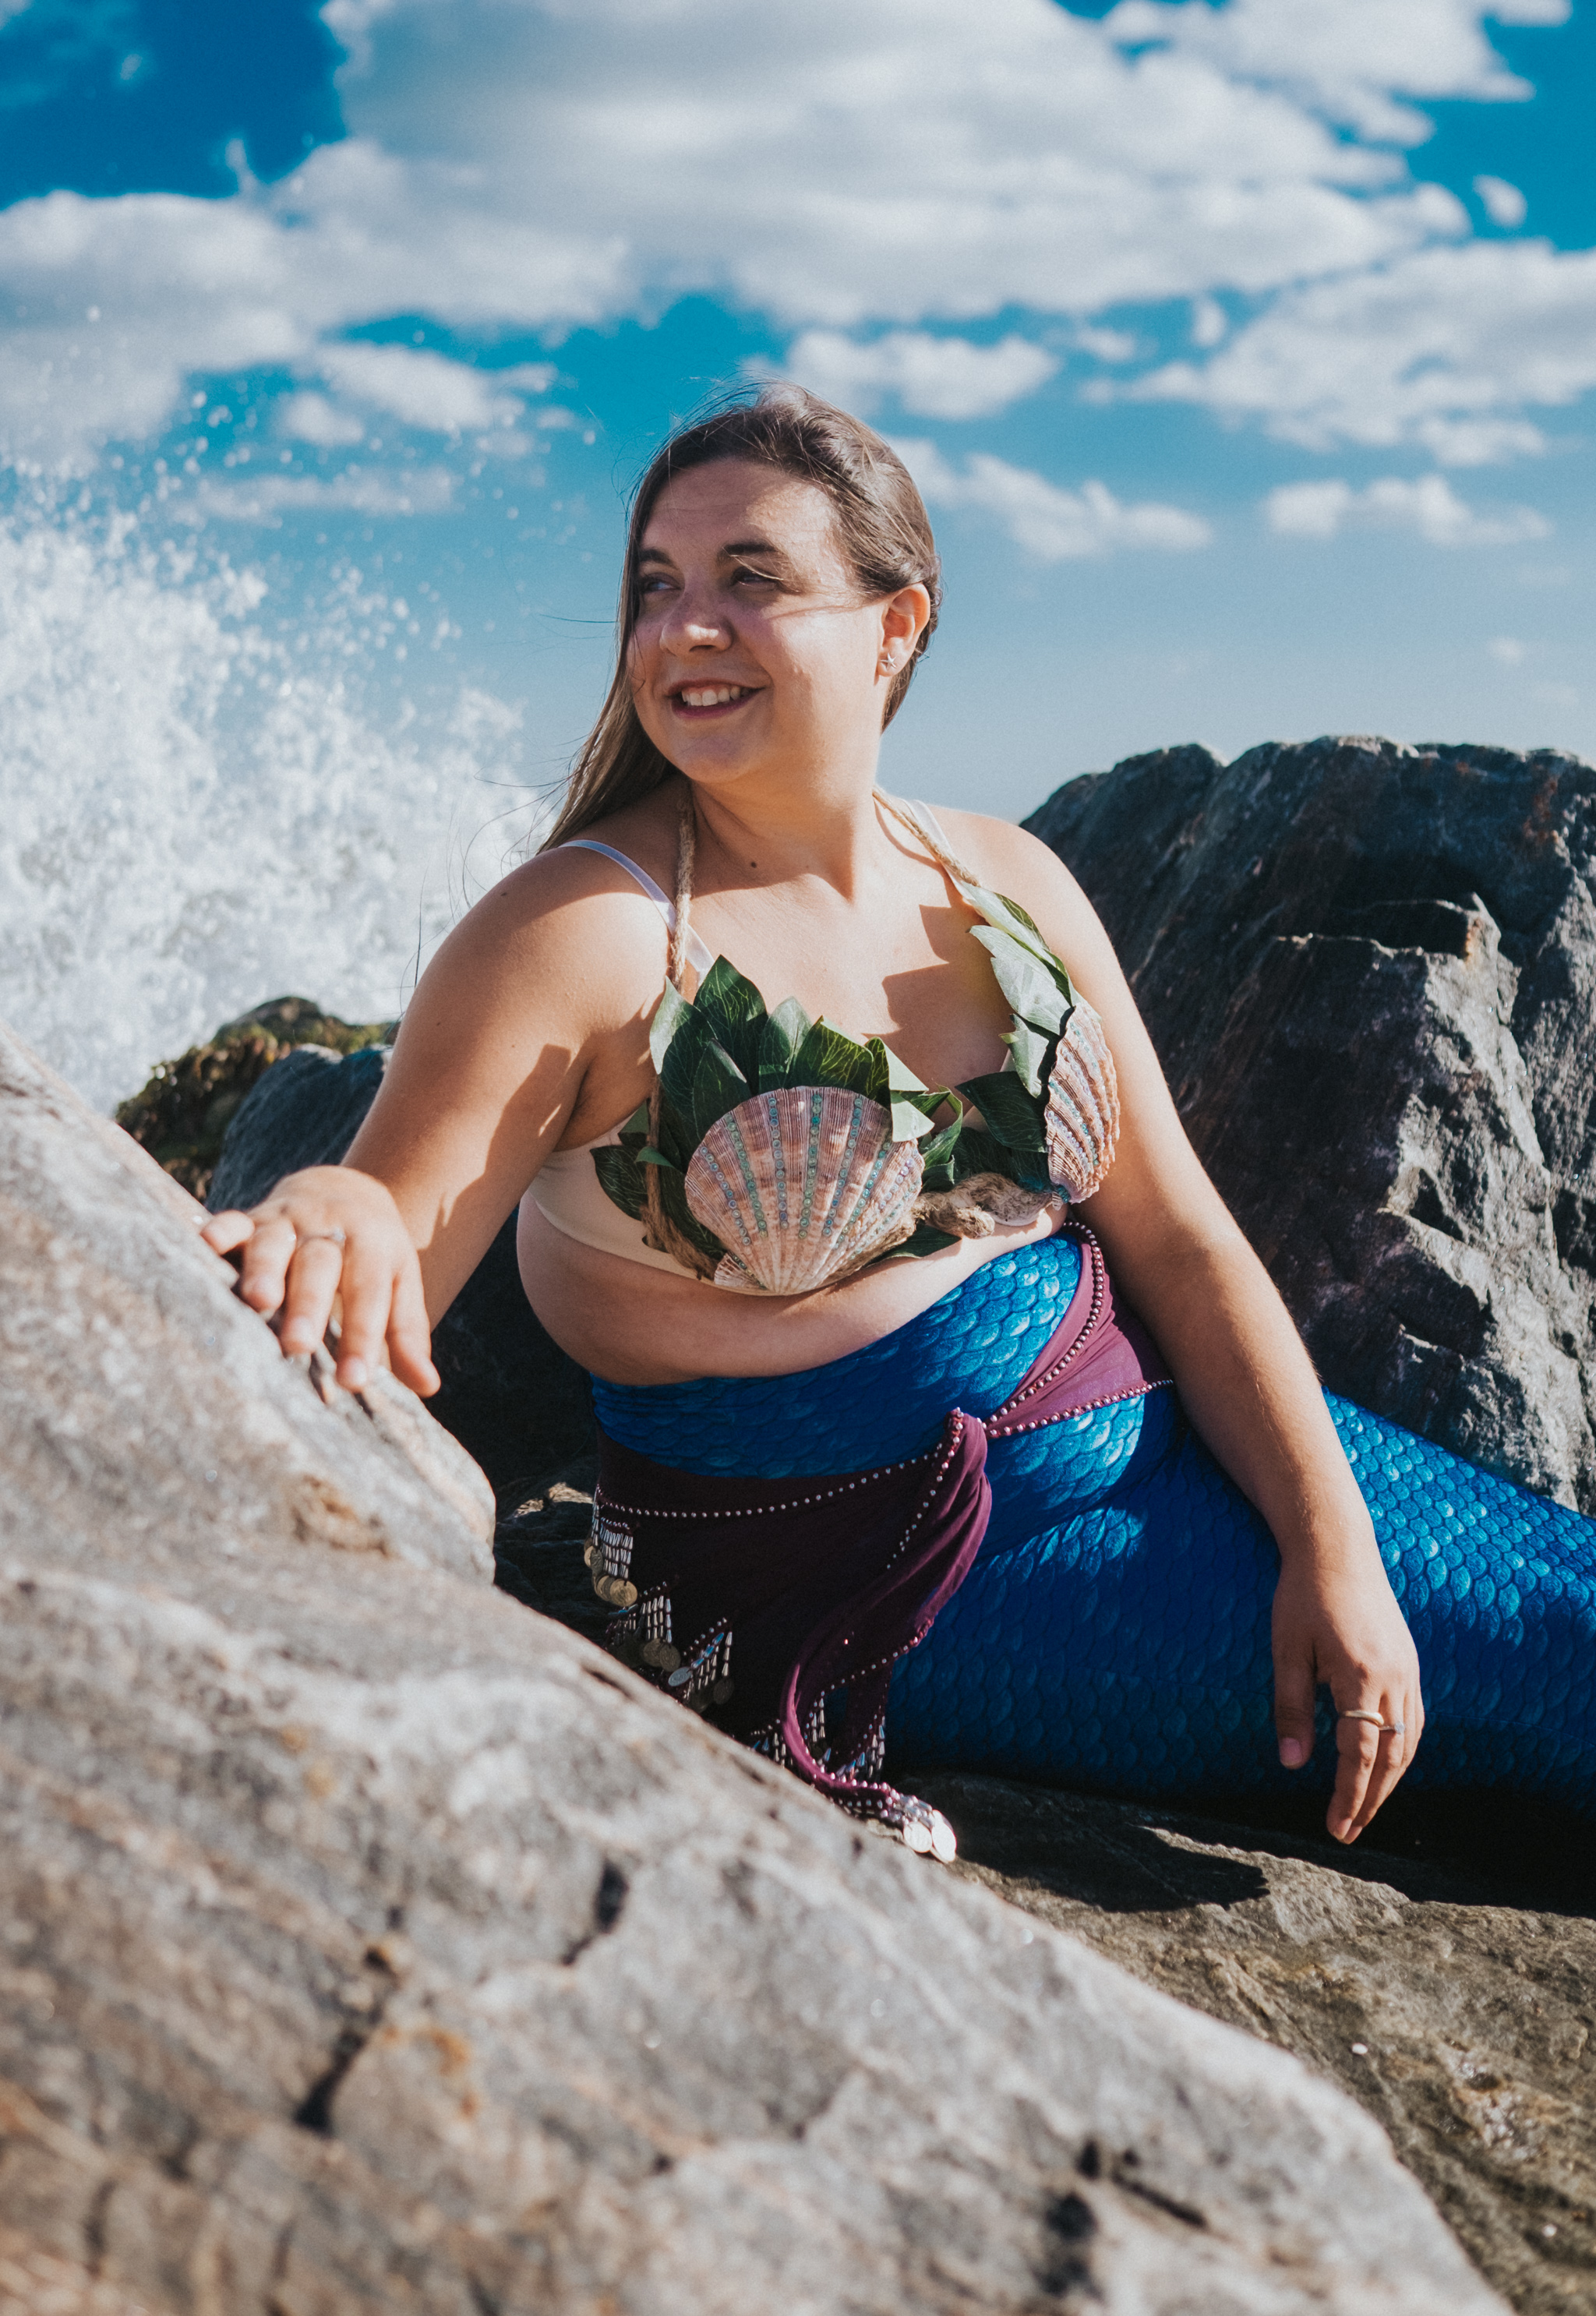 Body-Positive-Mermaids-Grace-Elizabeth-Mermaiding-UK-Alternative-Wedding-Photographer-Colchester-Essex-Suffolk-Norfolk-Devon (41 of 59).jpg